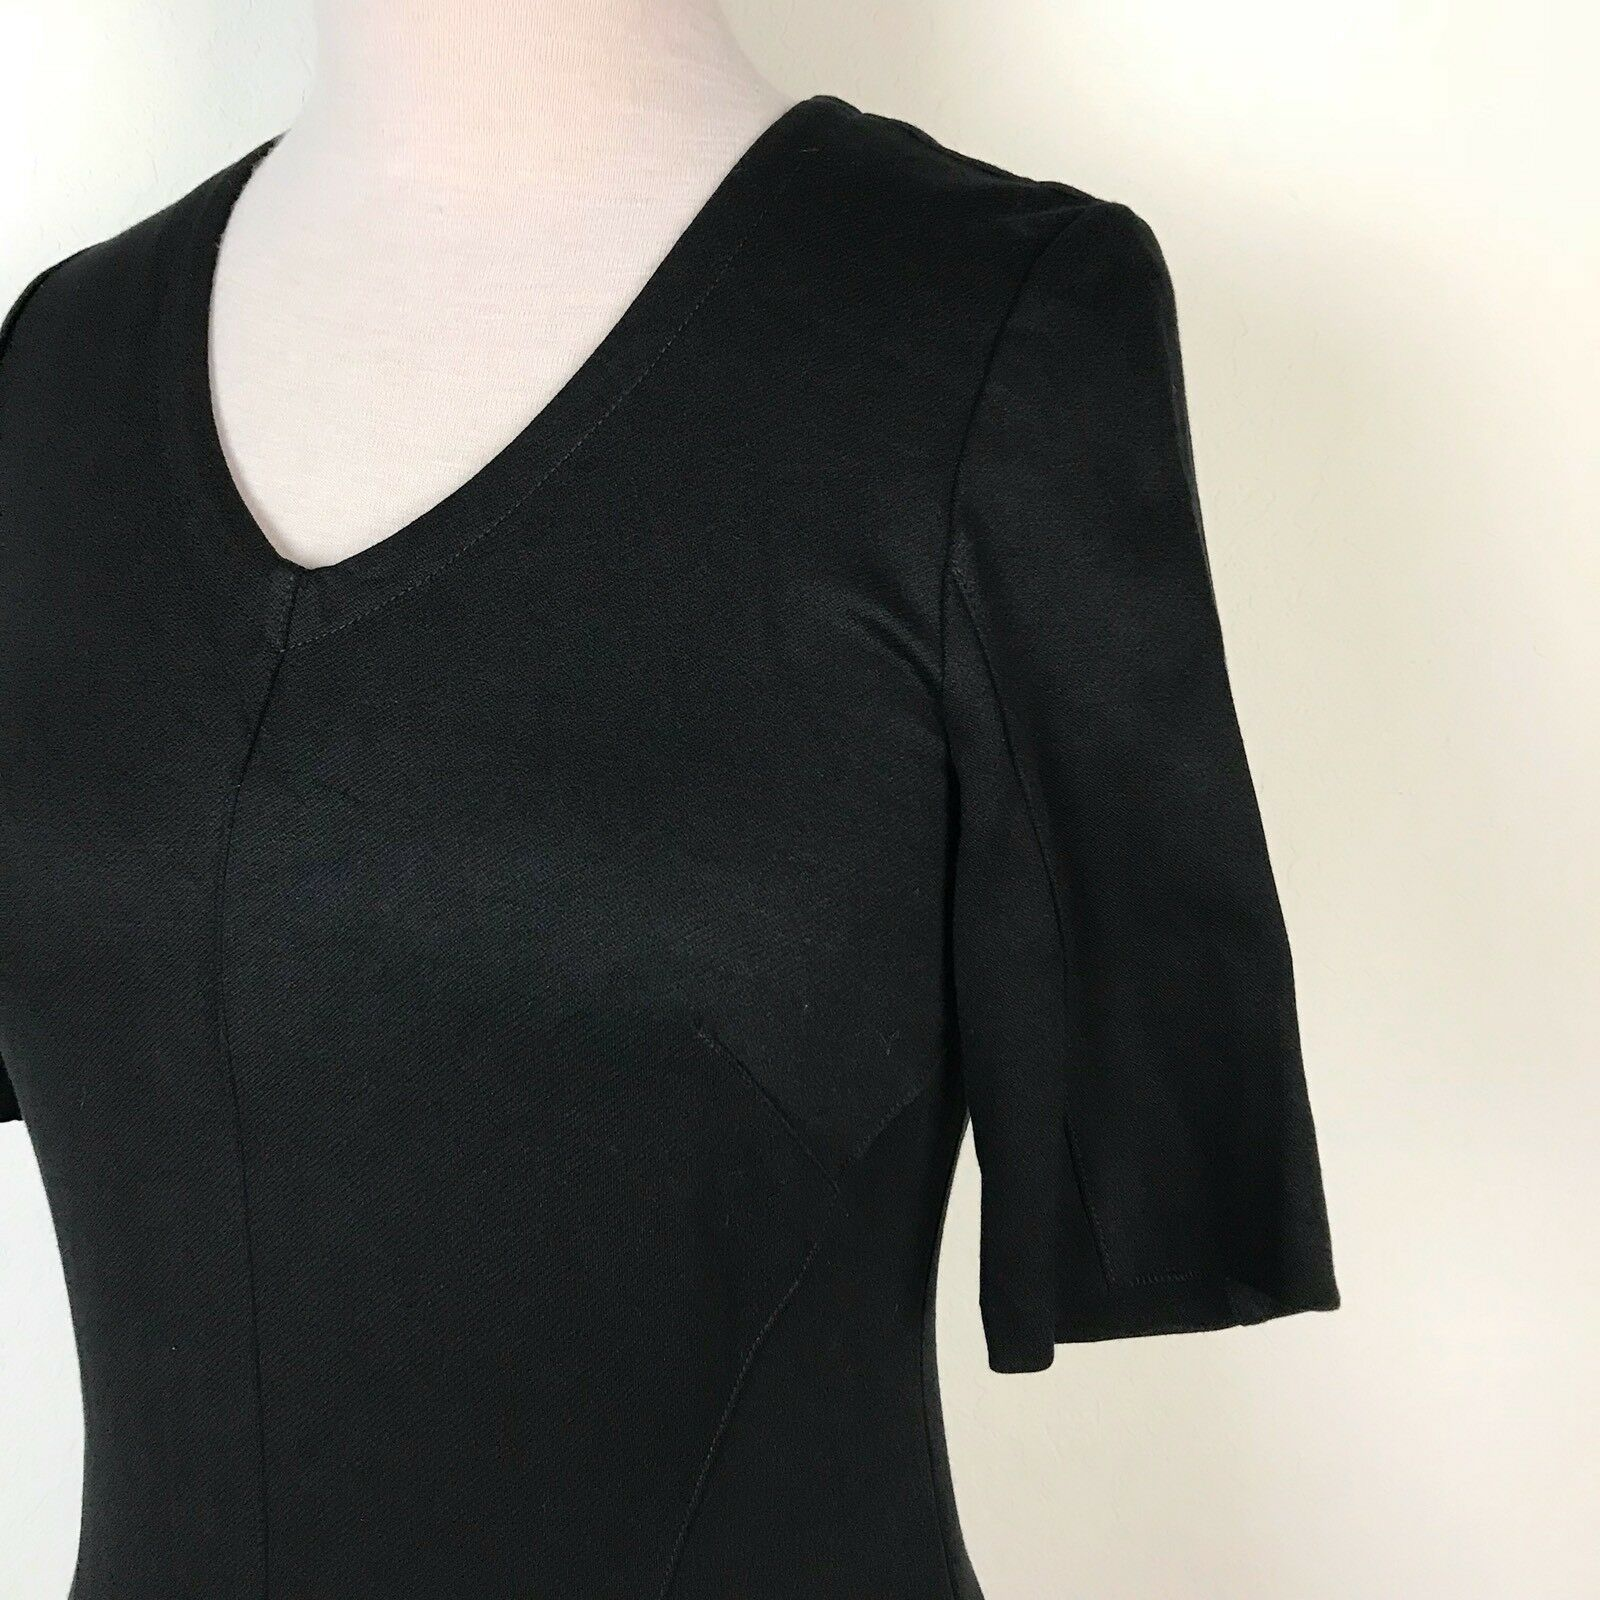 Cabi Claire Black Dress Career Evening LBD #3101 … - image 3